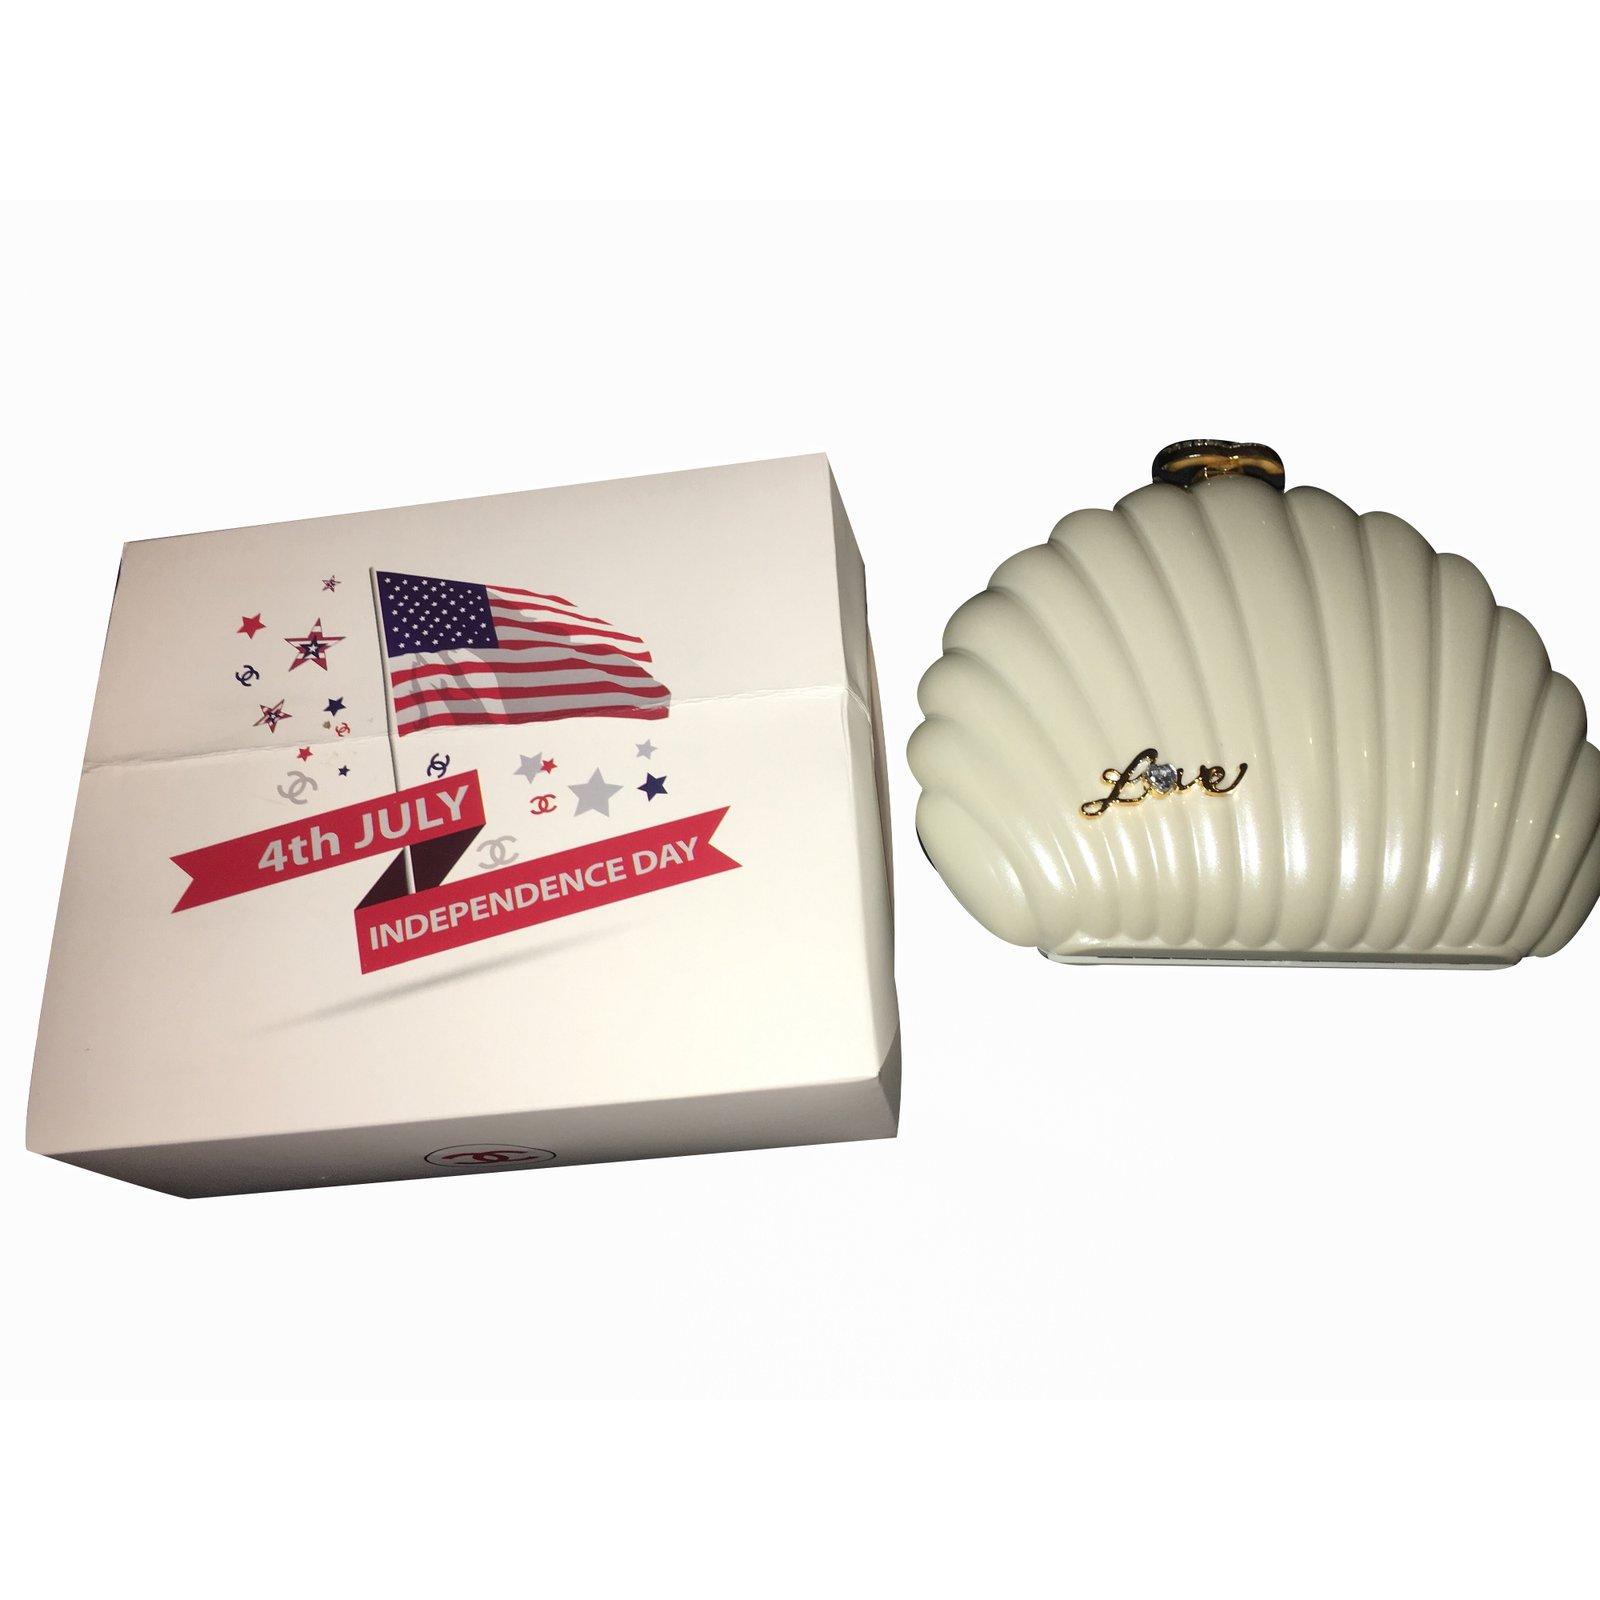 Shell chanels clutch photos